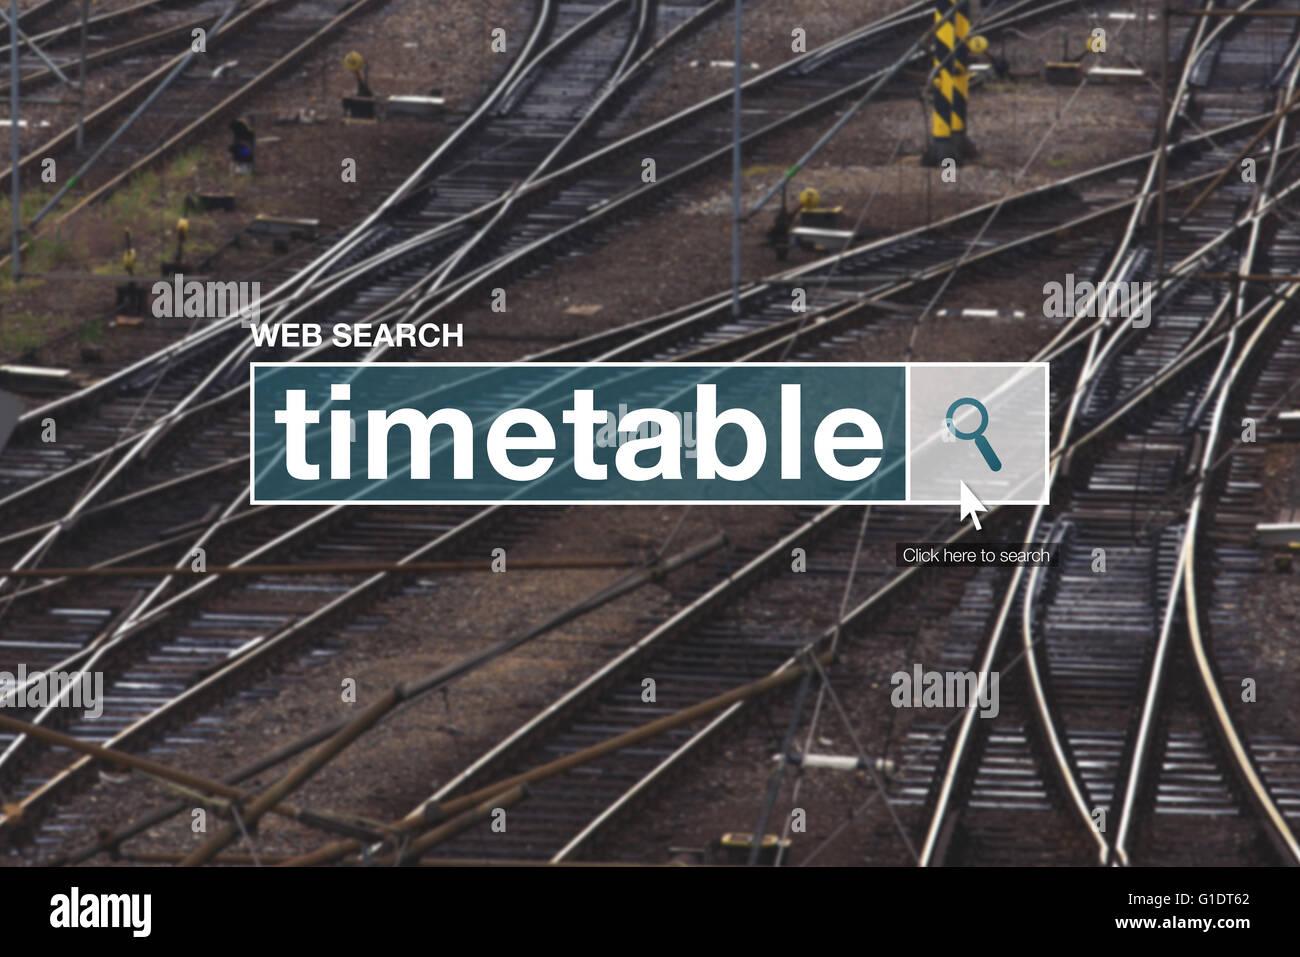 Railway timetable web search box on internet - Stock Image